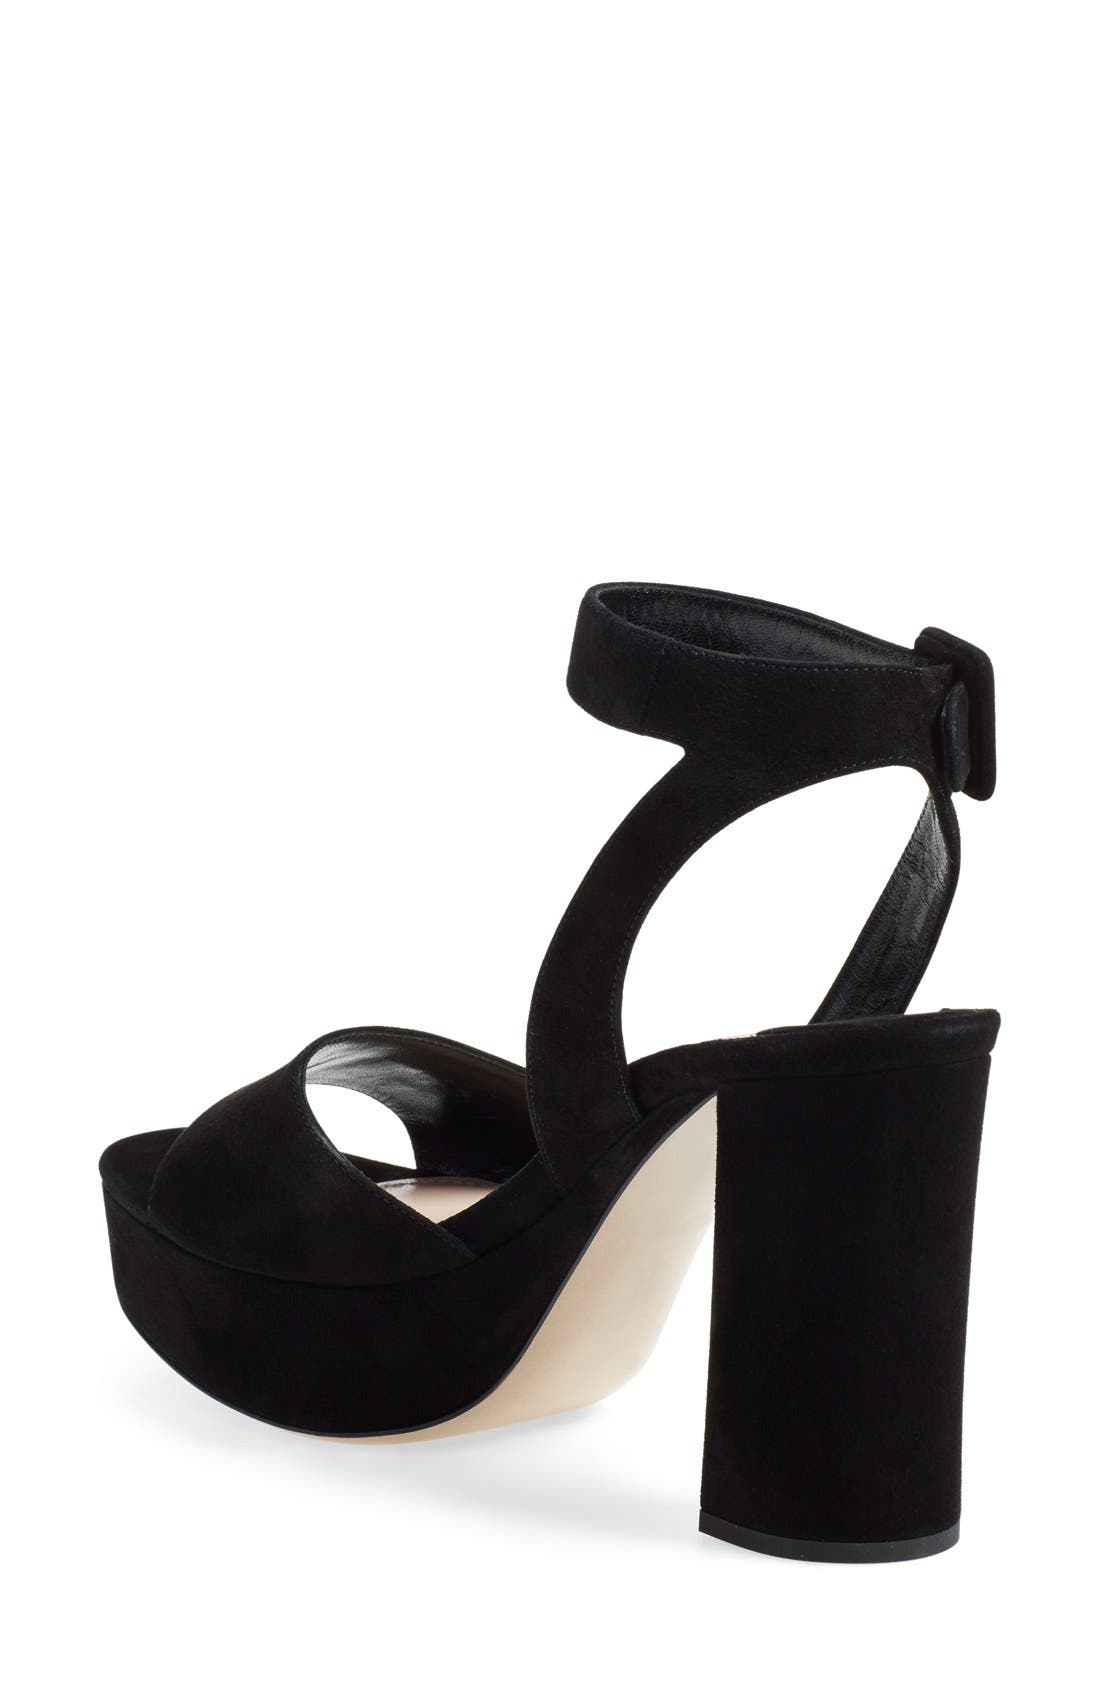 'Sandali' Ankle Strap Sandal,                             Alternate thumbnail 2, color,                             Black